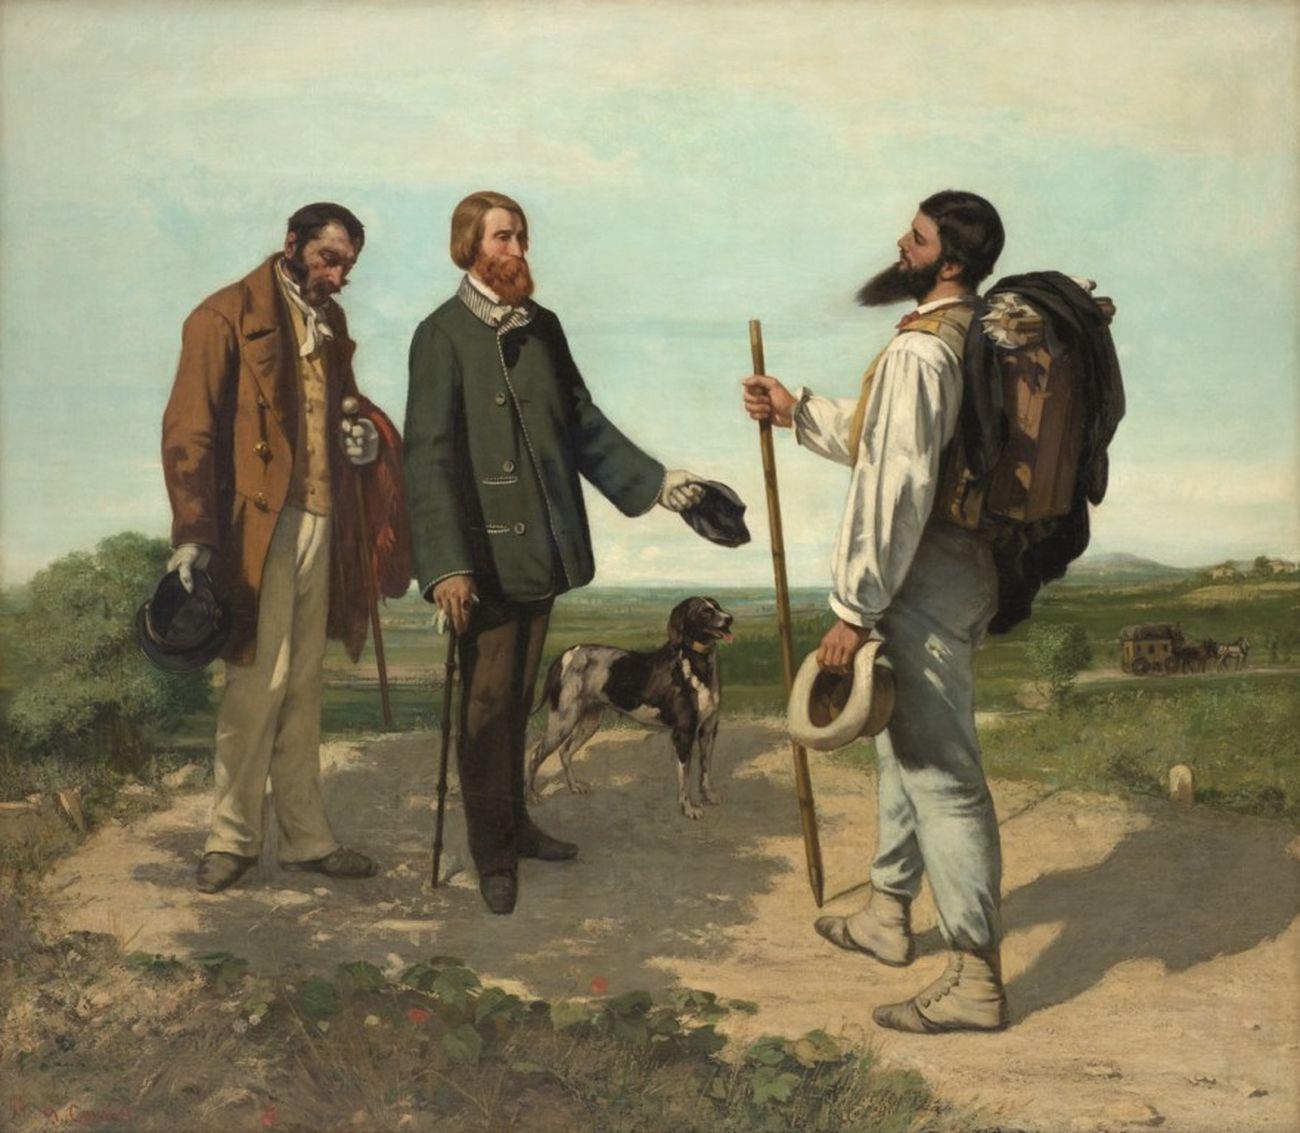 Gustave Courbet, Buongiorno signor Courbet, 1854. Montepellier Mediterranée Metropole, Musée Fabre